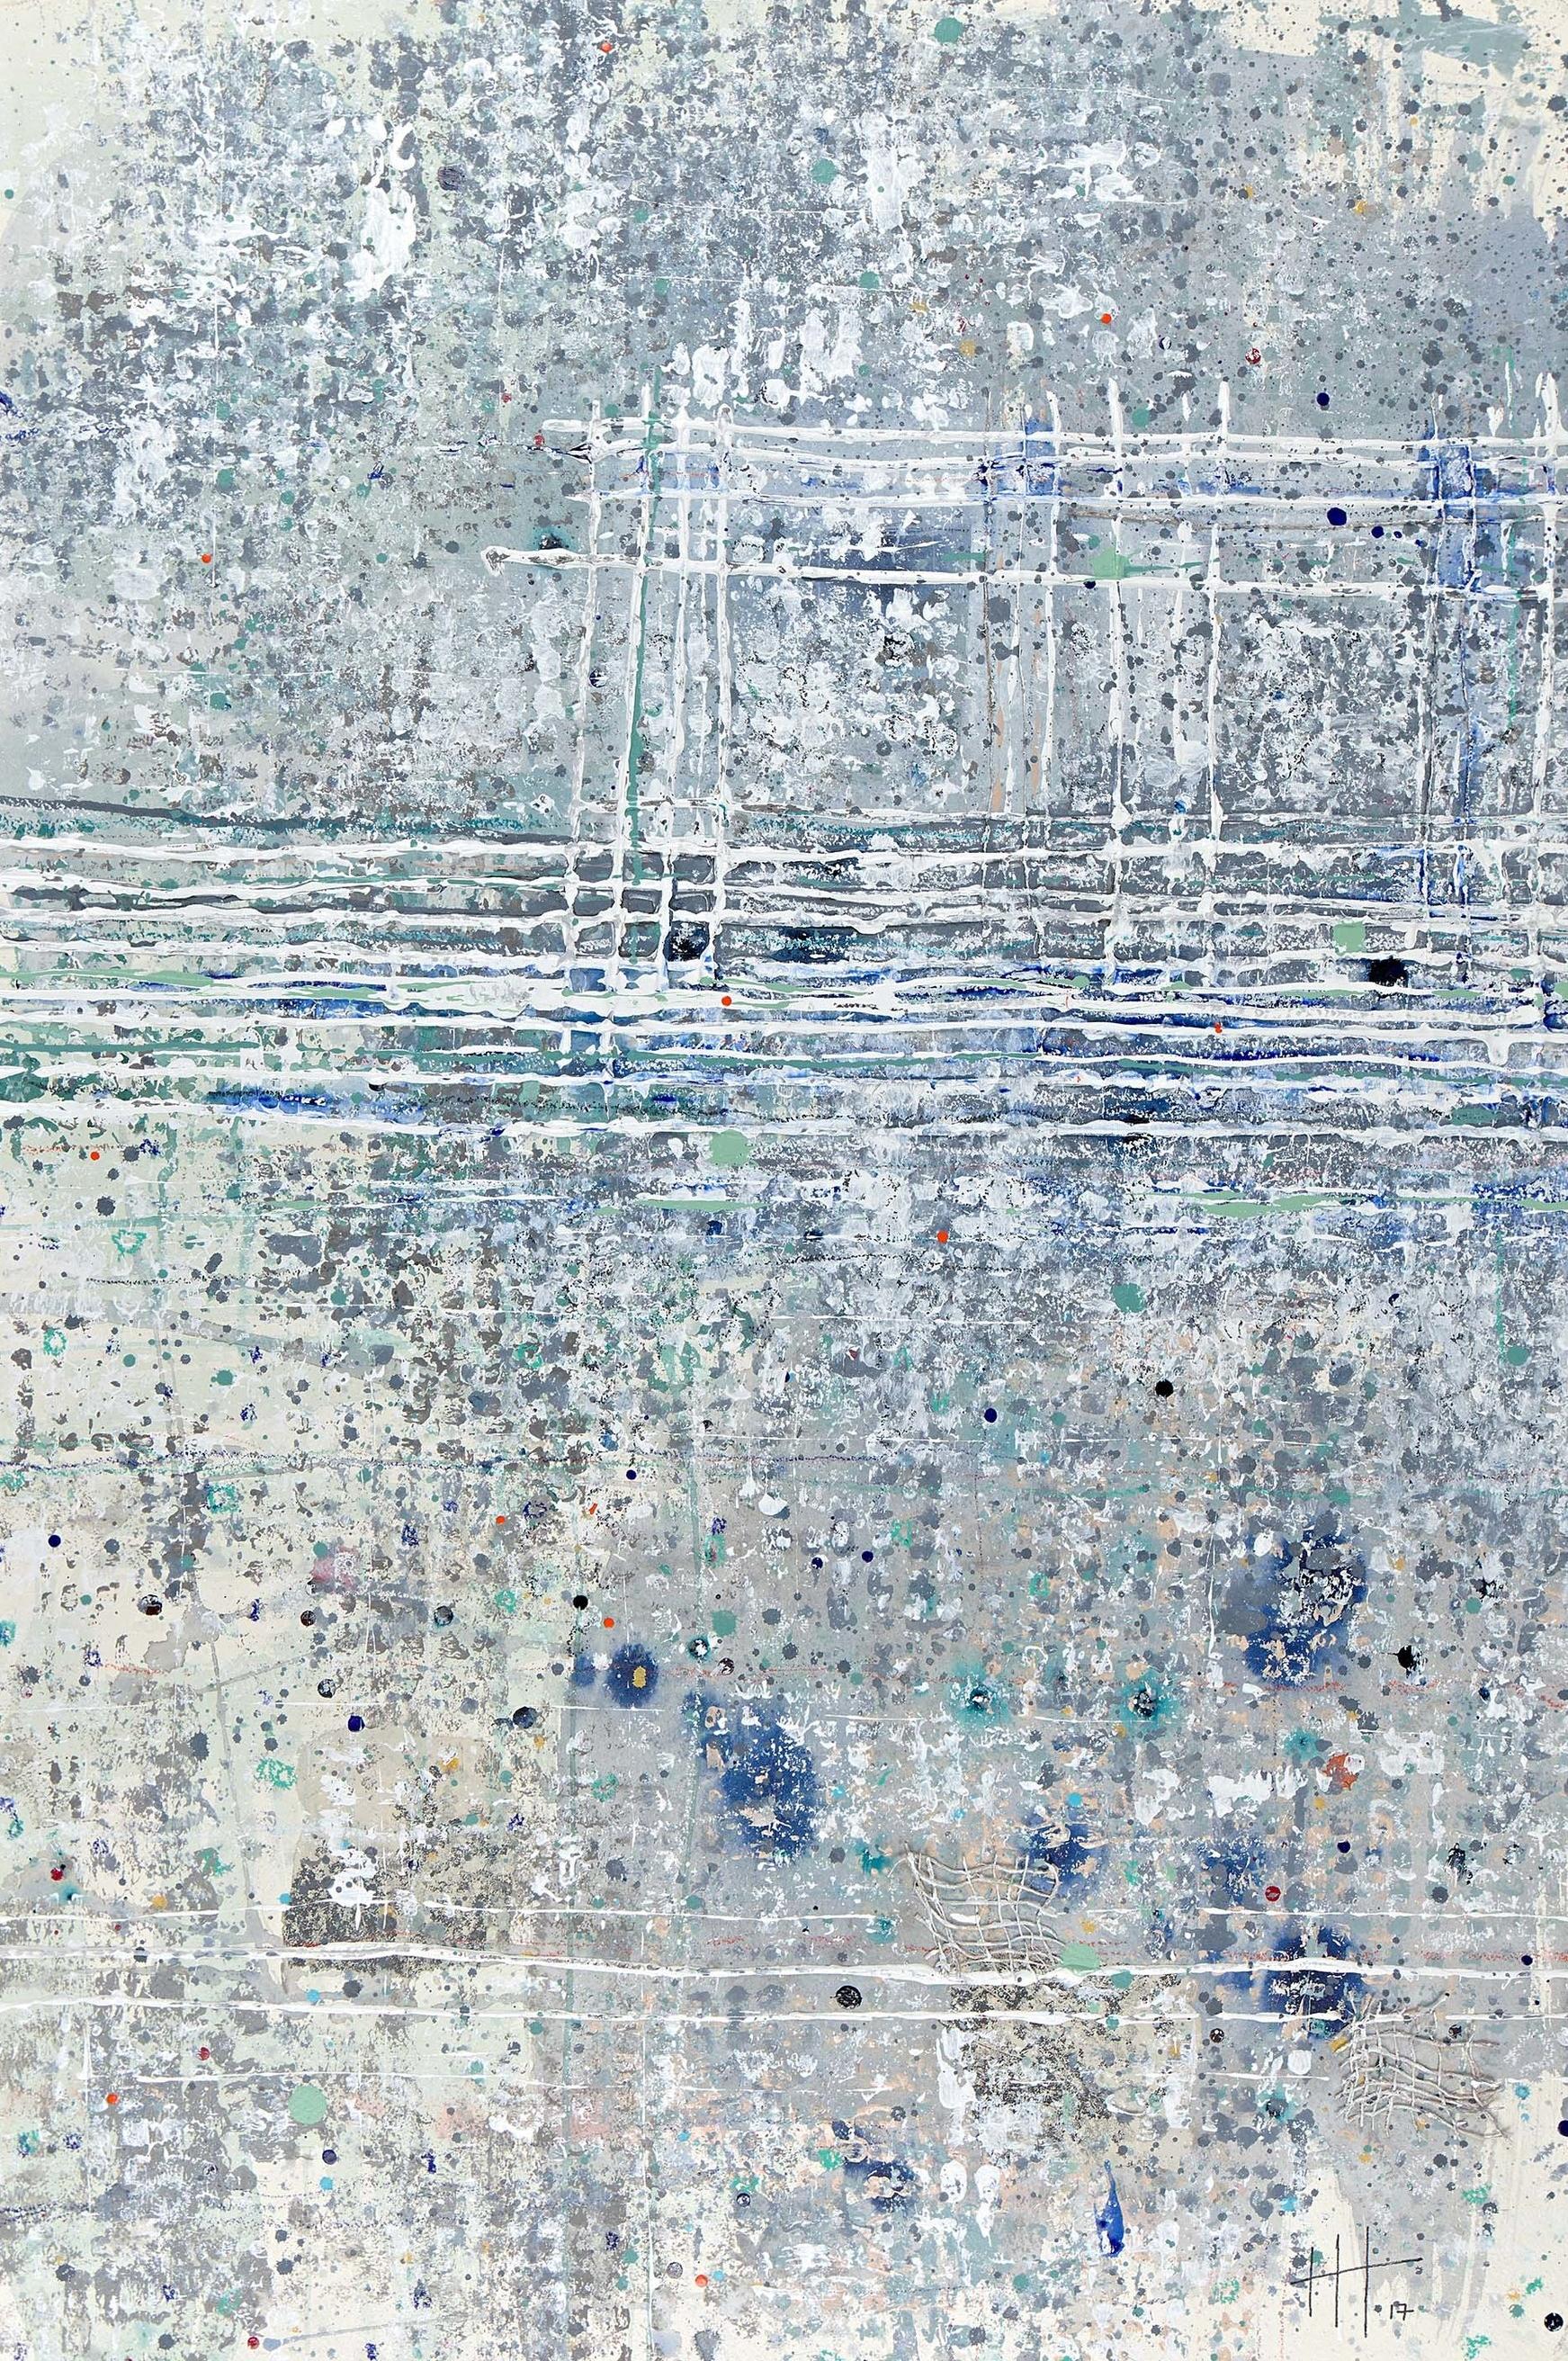 'Marshwood' Acrylic & Mixed Media / 119cm x 93cm (framed) SOLD